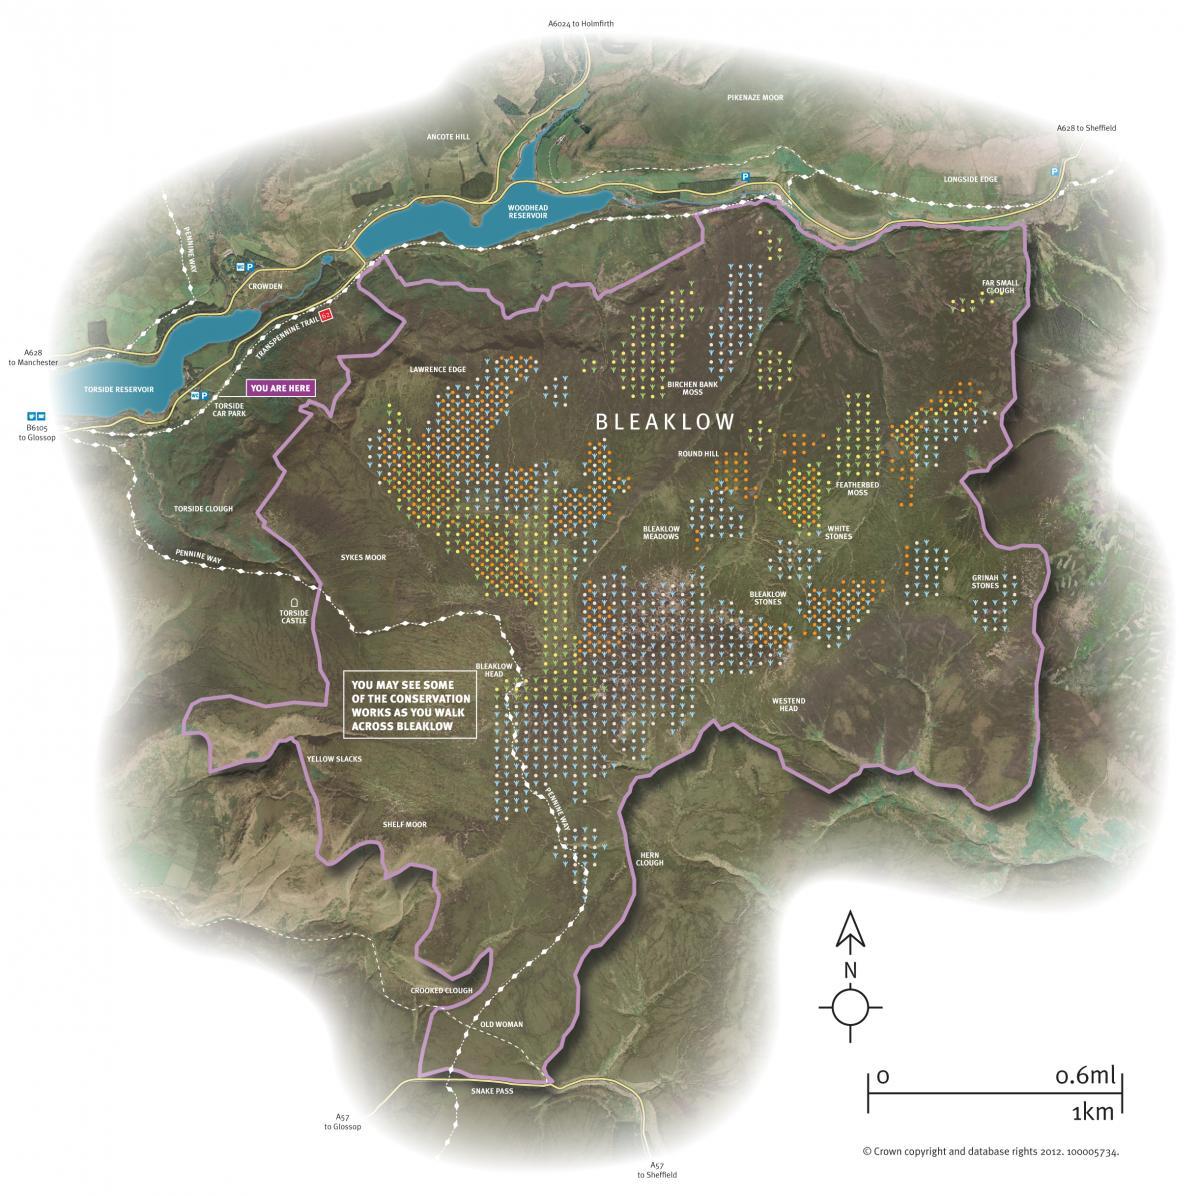 Map of Bleaklow